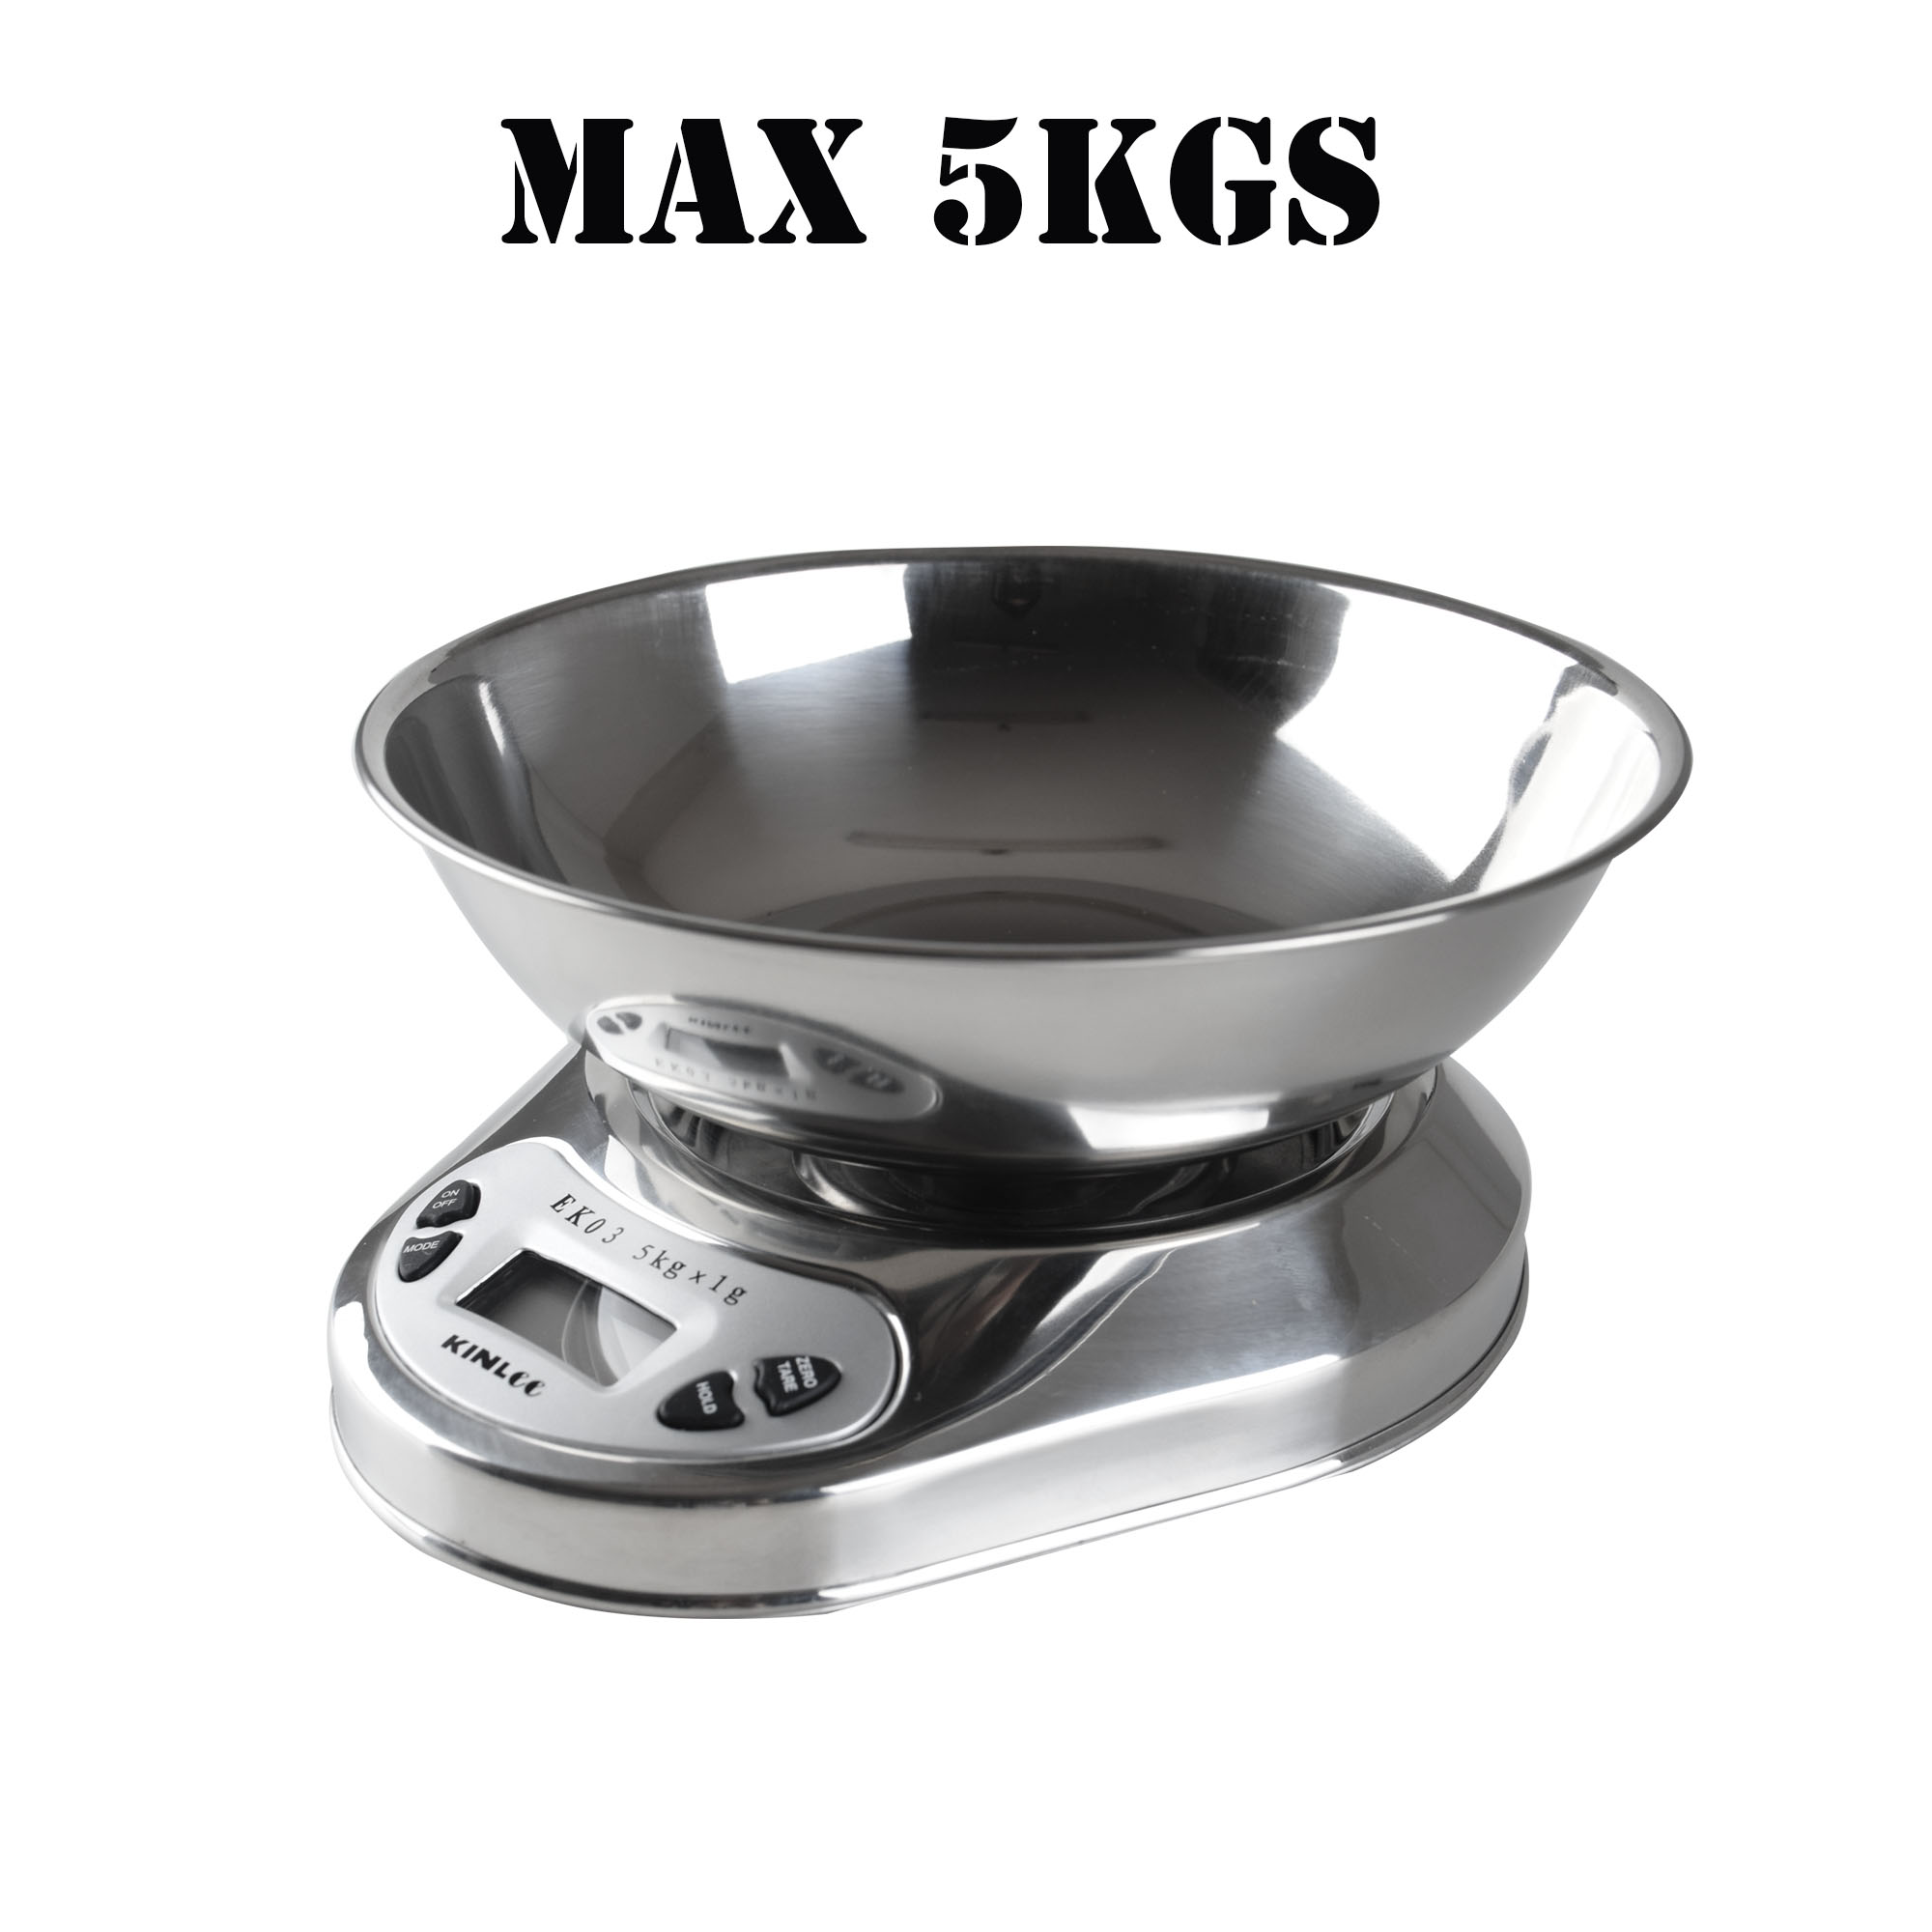 Malachi Ek03b Stainless Steel Electronic Weight Scale Food Balance